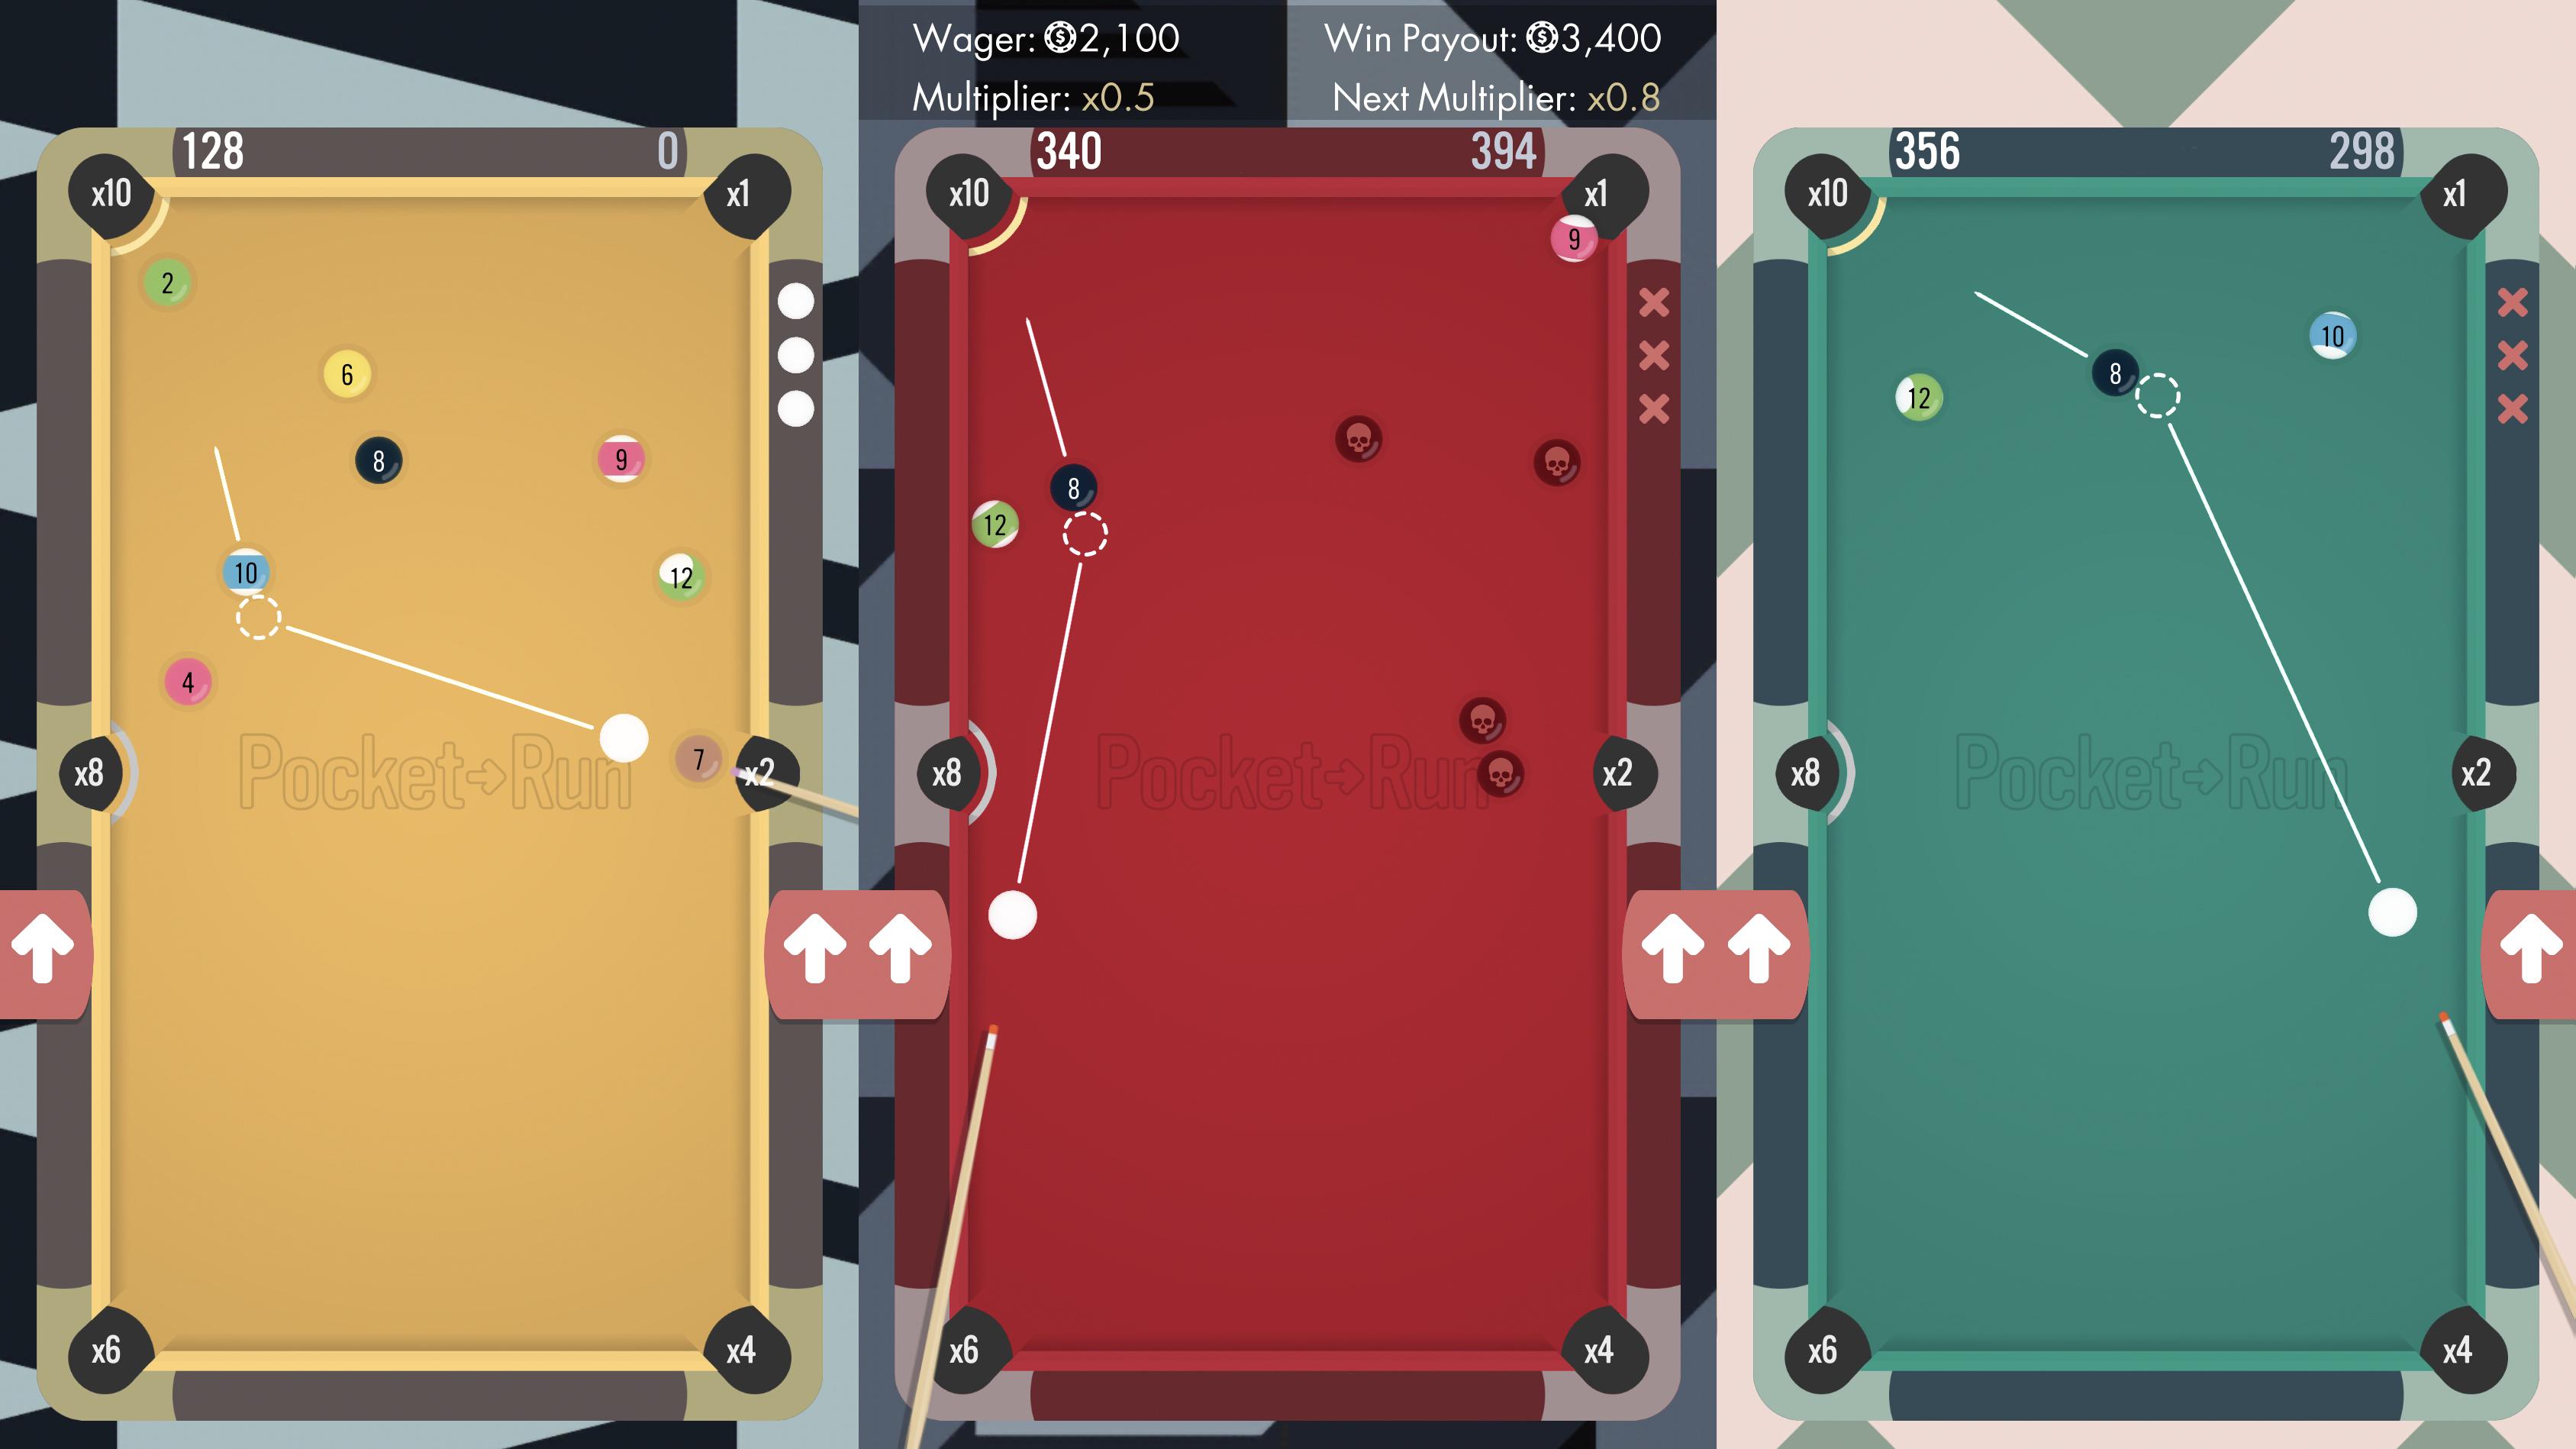 Pocket Run Pool